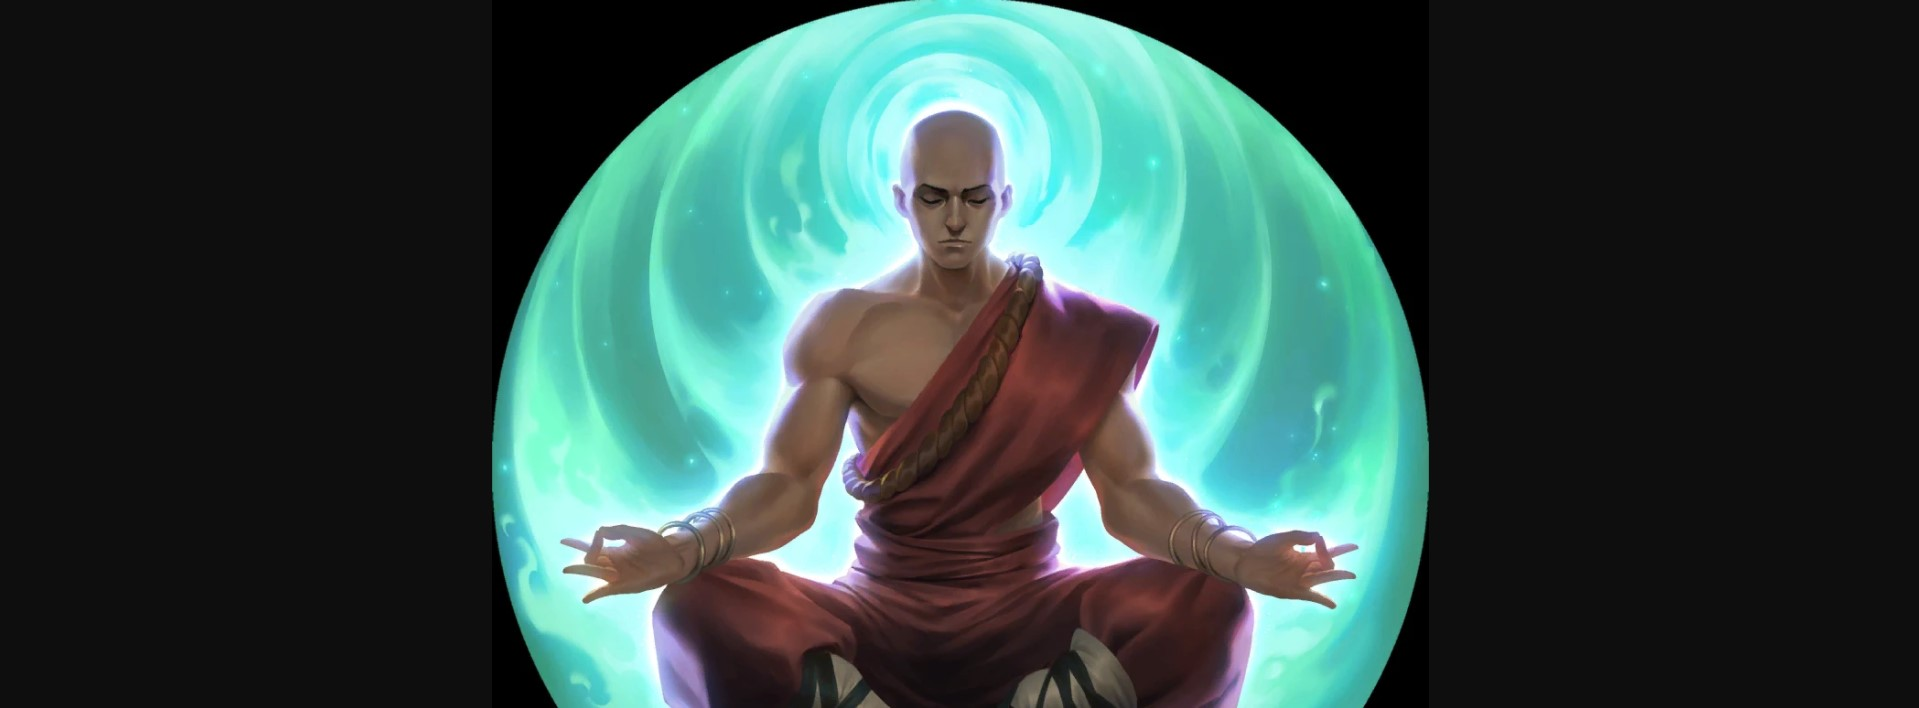 Top 5 Ionia Cards in Legends of Runeterra (Cosmic Creation)